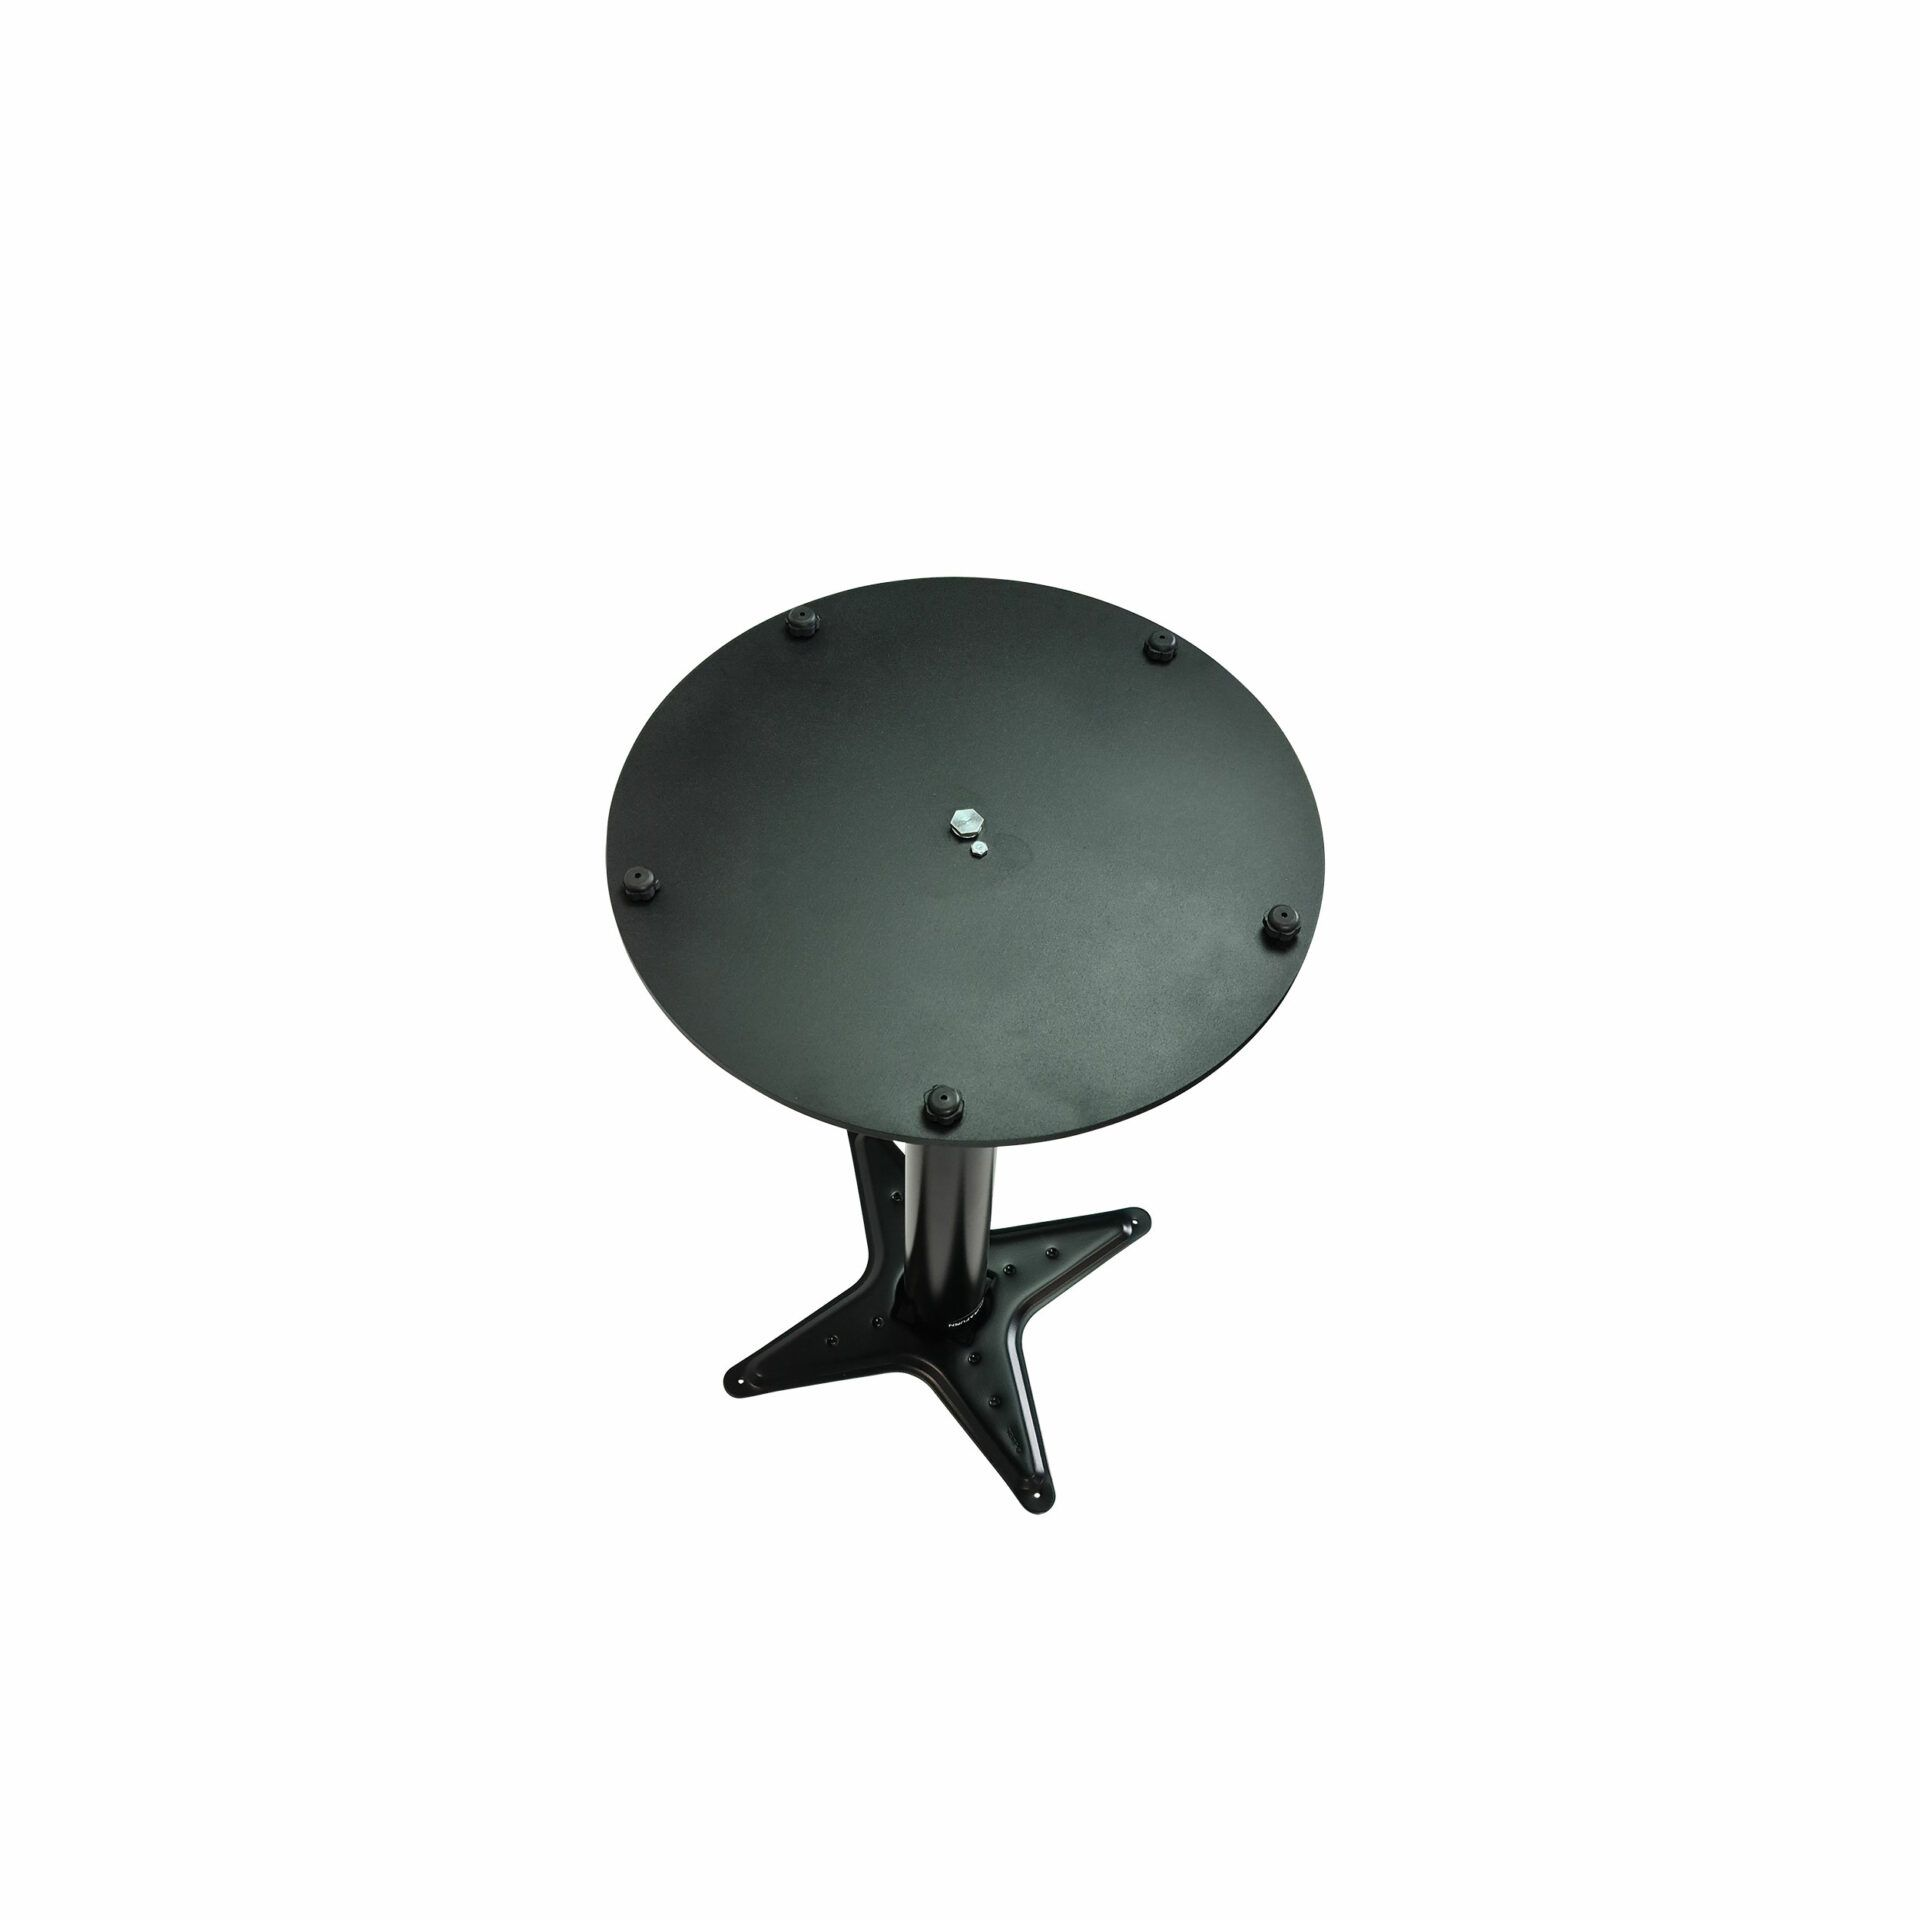 lyon table base black.bottom